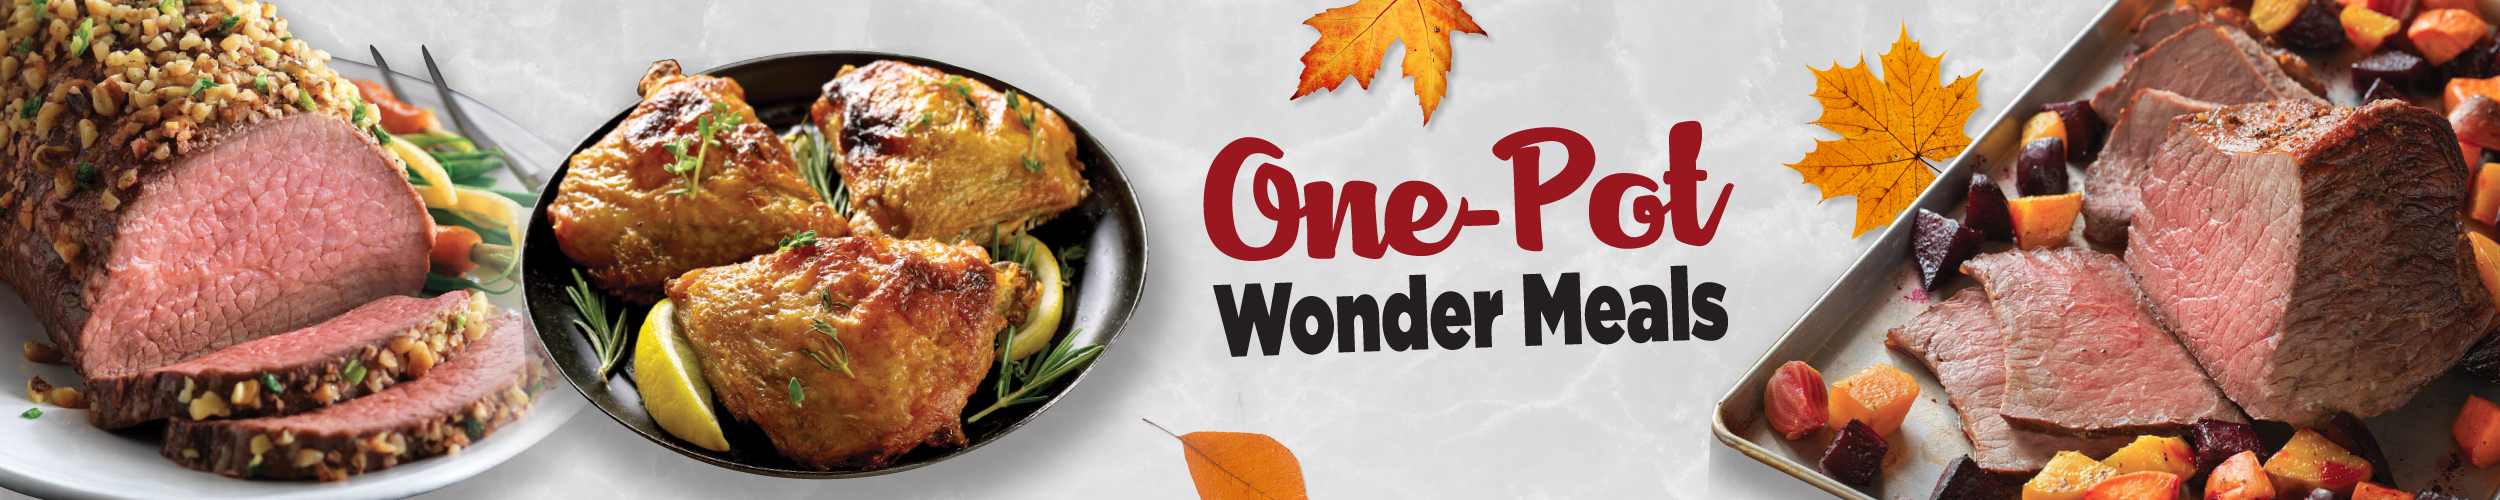 One Pot Wonder Meals